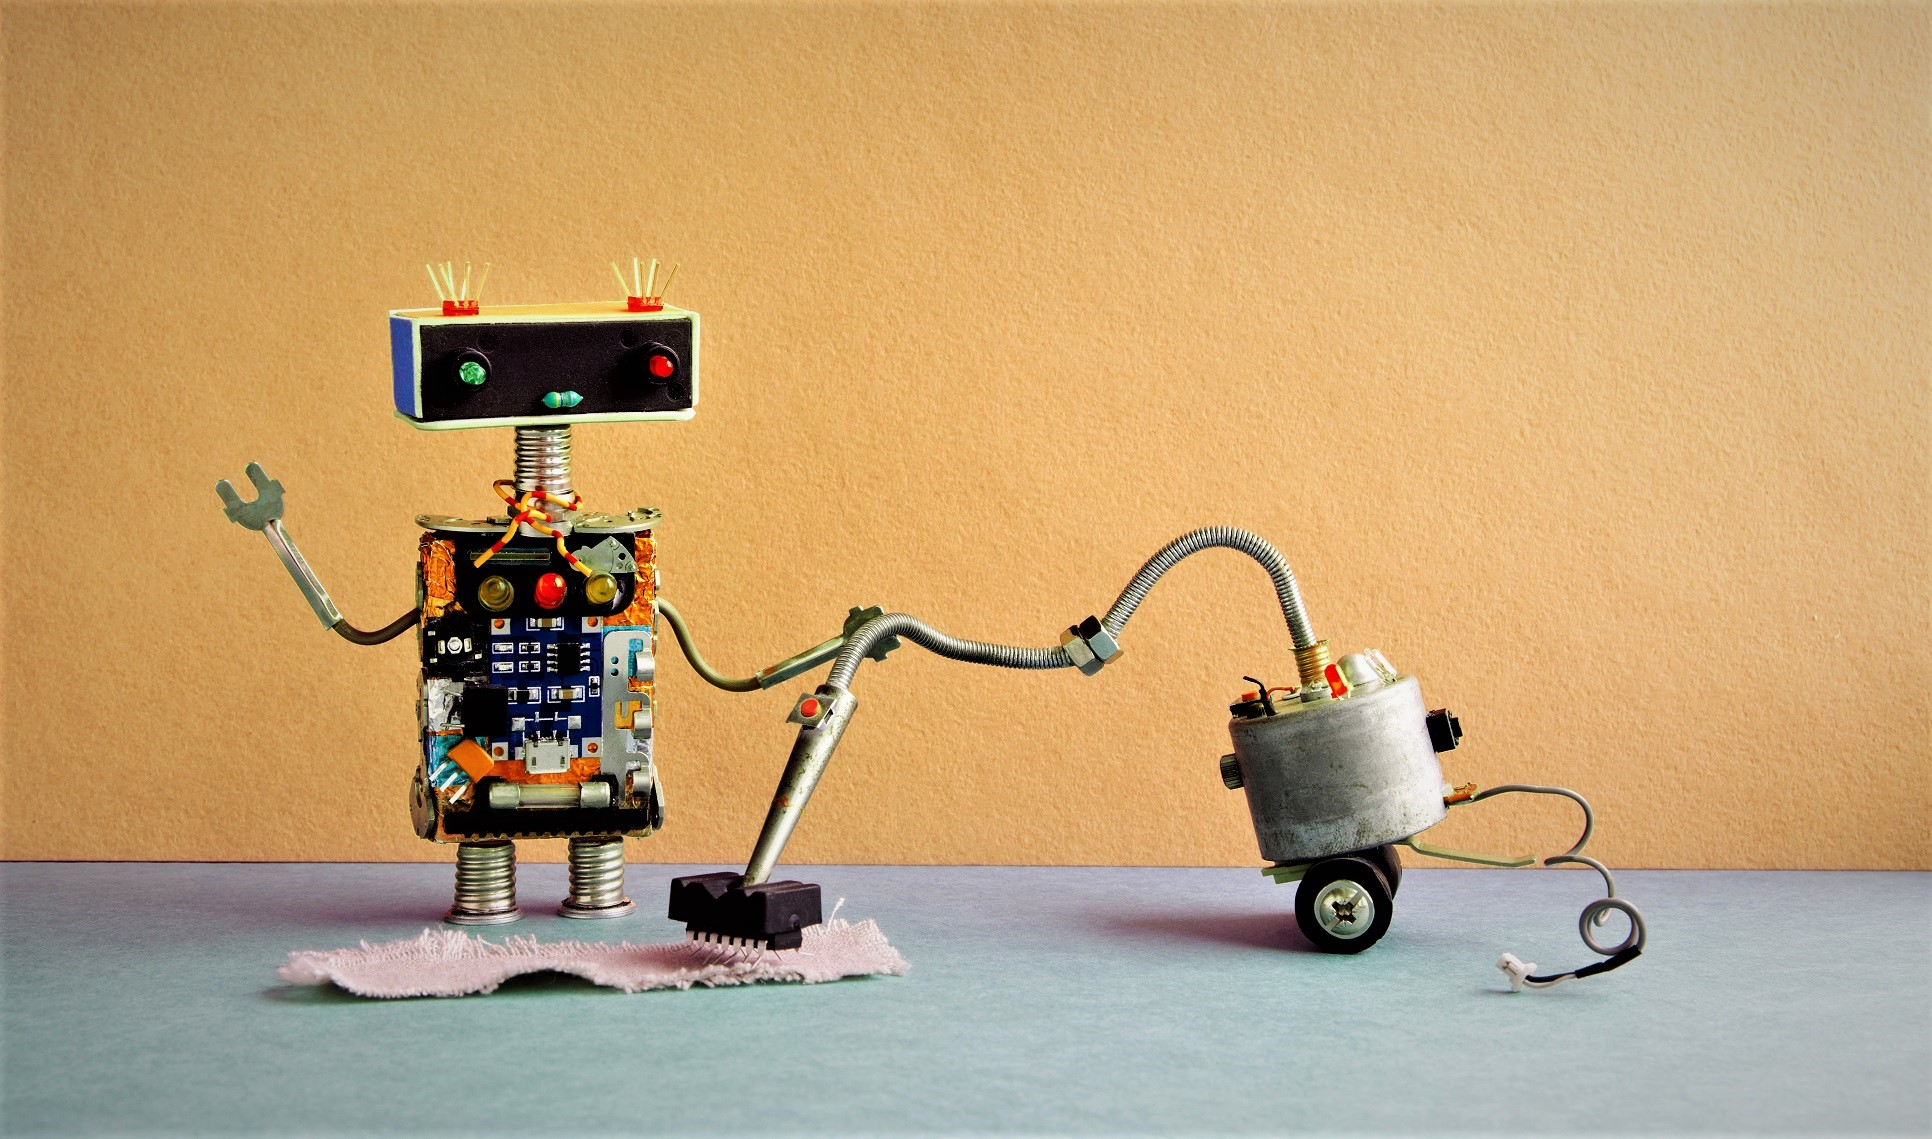 robot vacuum cleaner machine WYCQLH7 Другая SOVA гендер, уборка